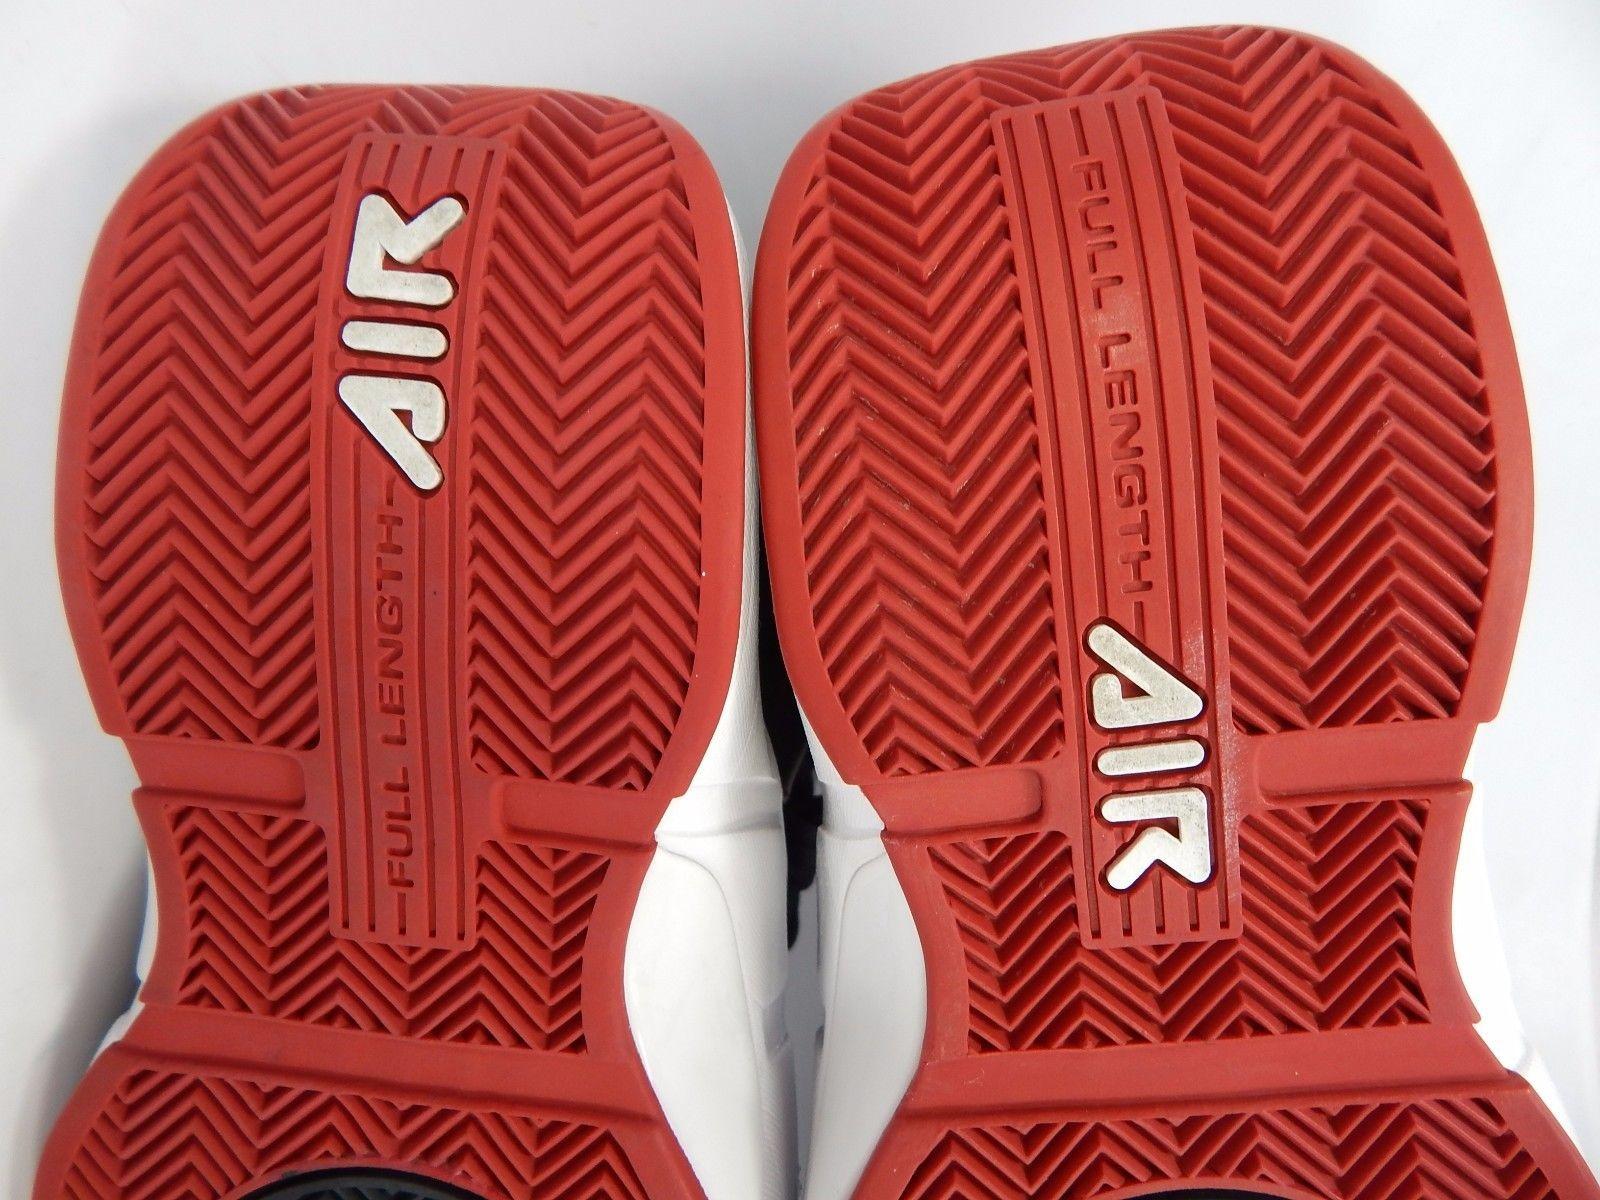 Nike Air Force Men's Basketball Shoes Sz US 11 M (D) EU 45 Black 316186-001